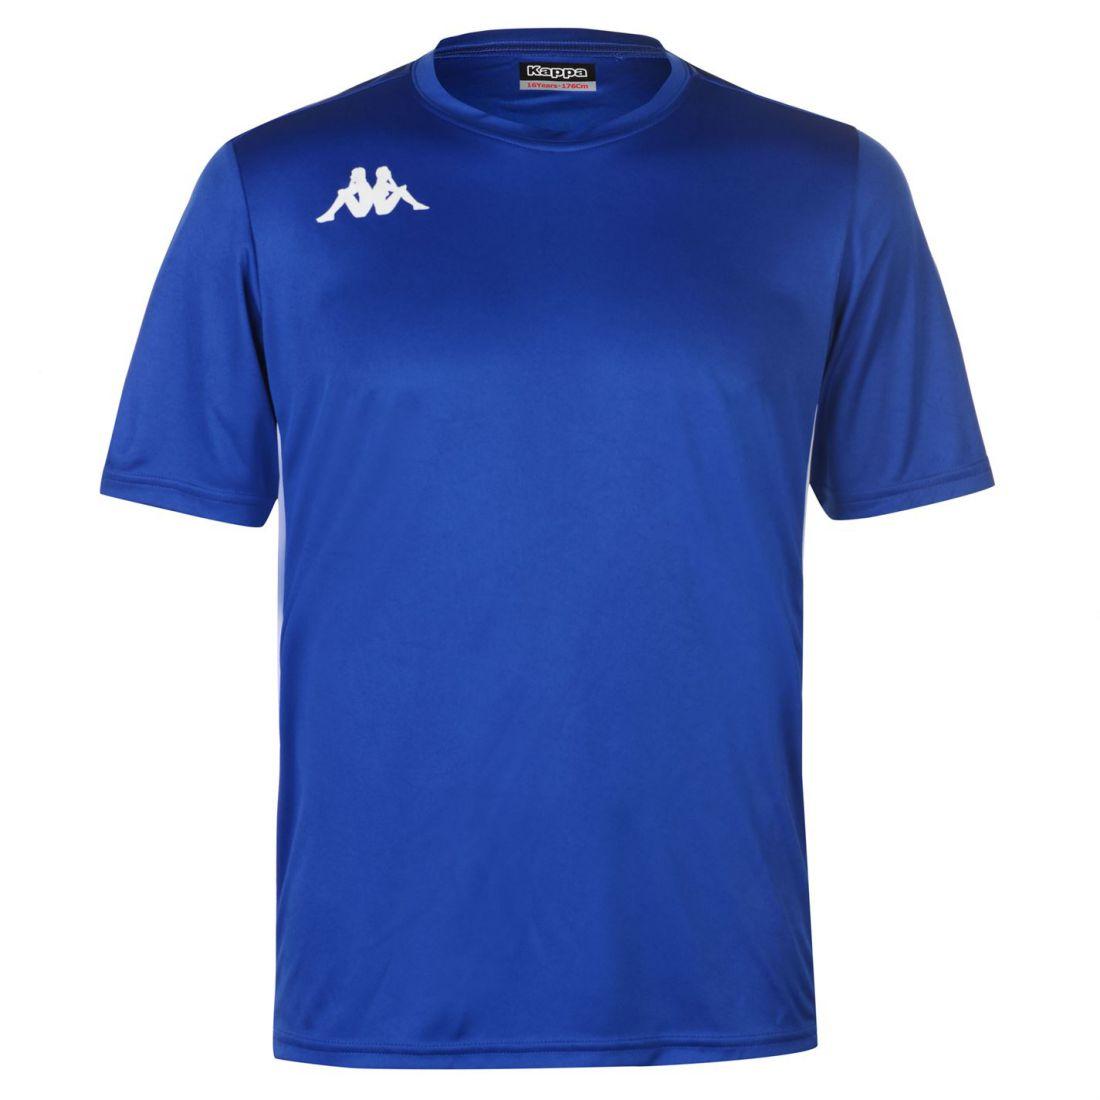 0ce18cb777a8 Kappa Torino Short Sleeve T Shirt Mens Gents Crew Neck Tee Top ...